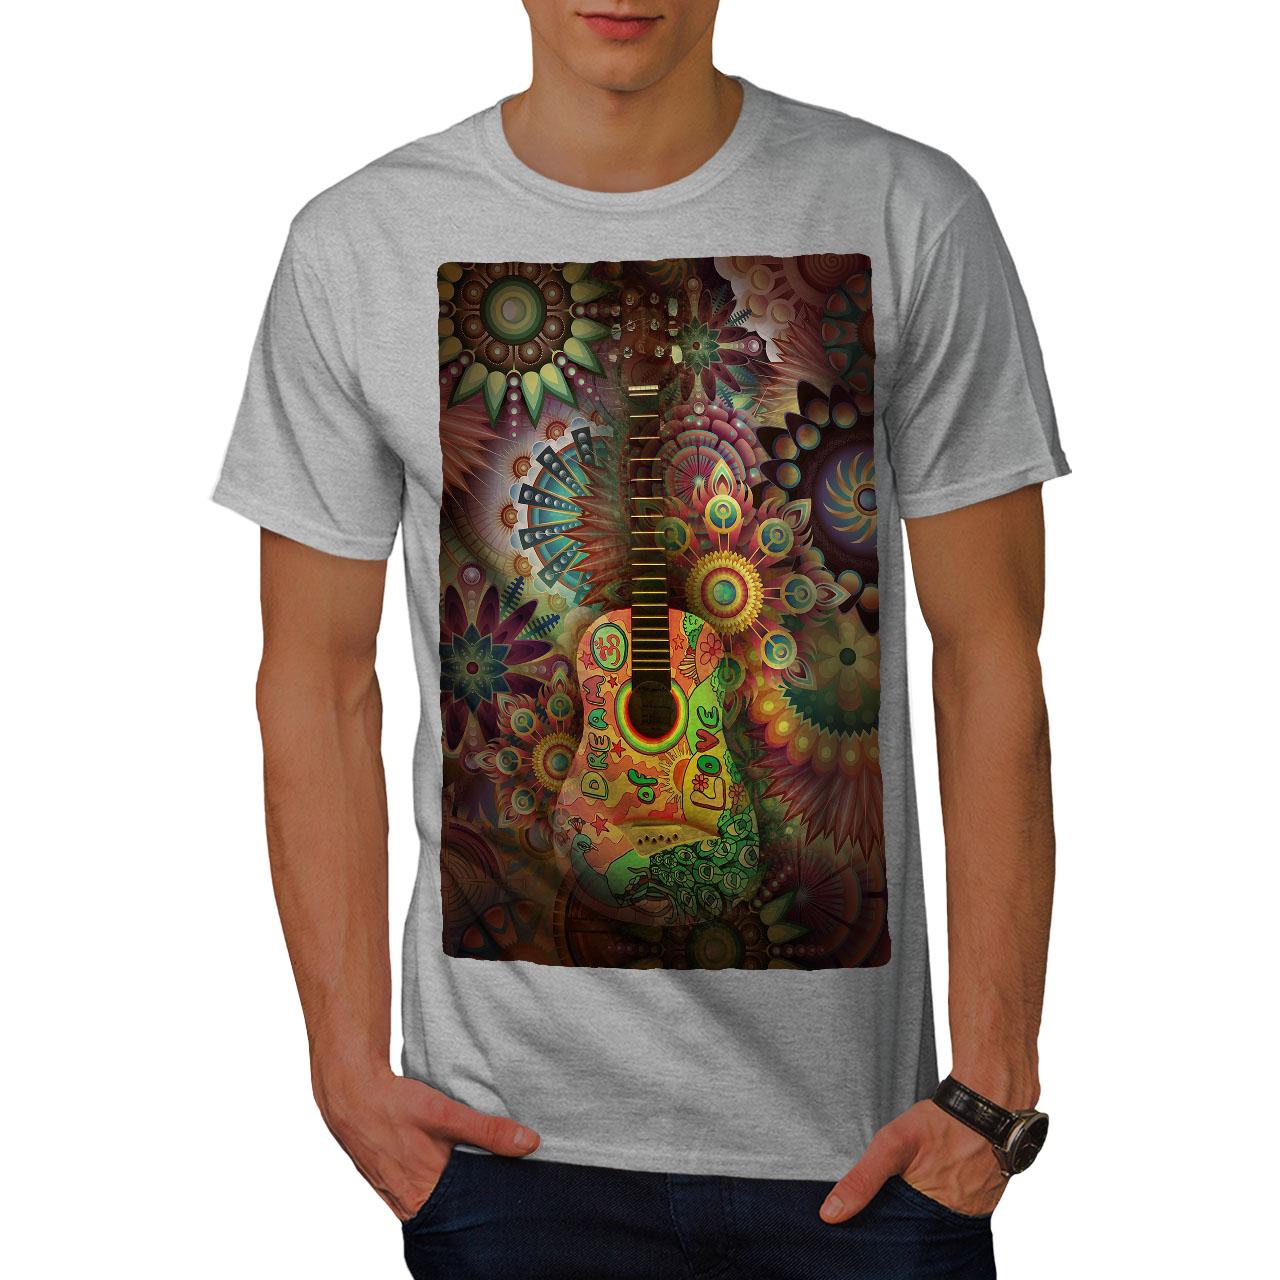 Wellcoda-Colorful-Guitar-Mens-T-shirt-Music-Graphic-Design-Printed-Tee thumbnail 15